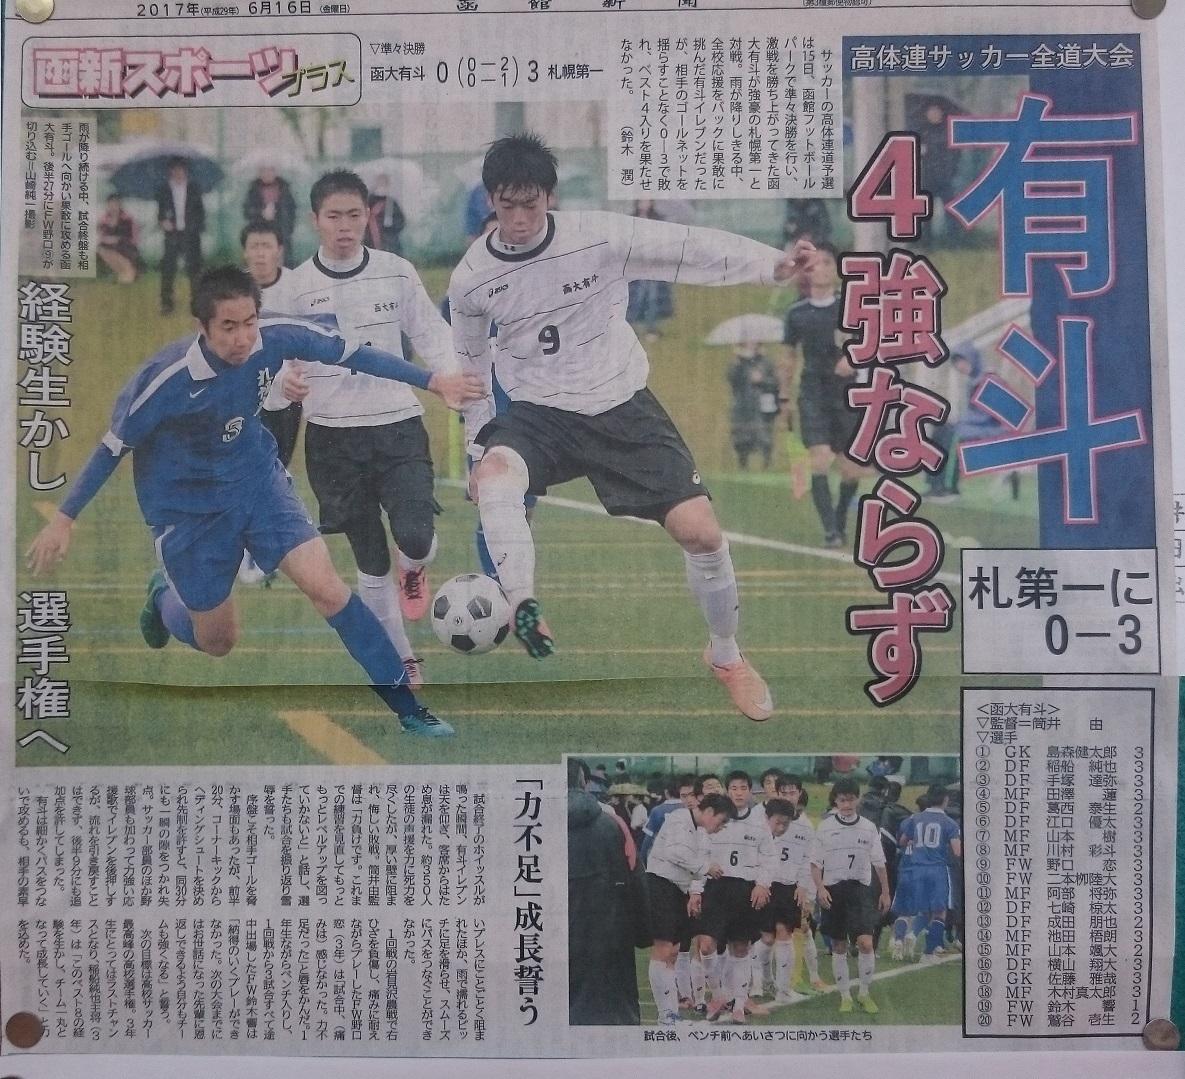 2017 soccer VS daiichi